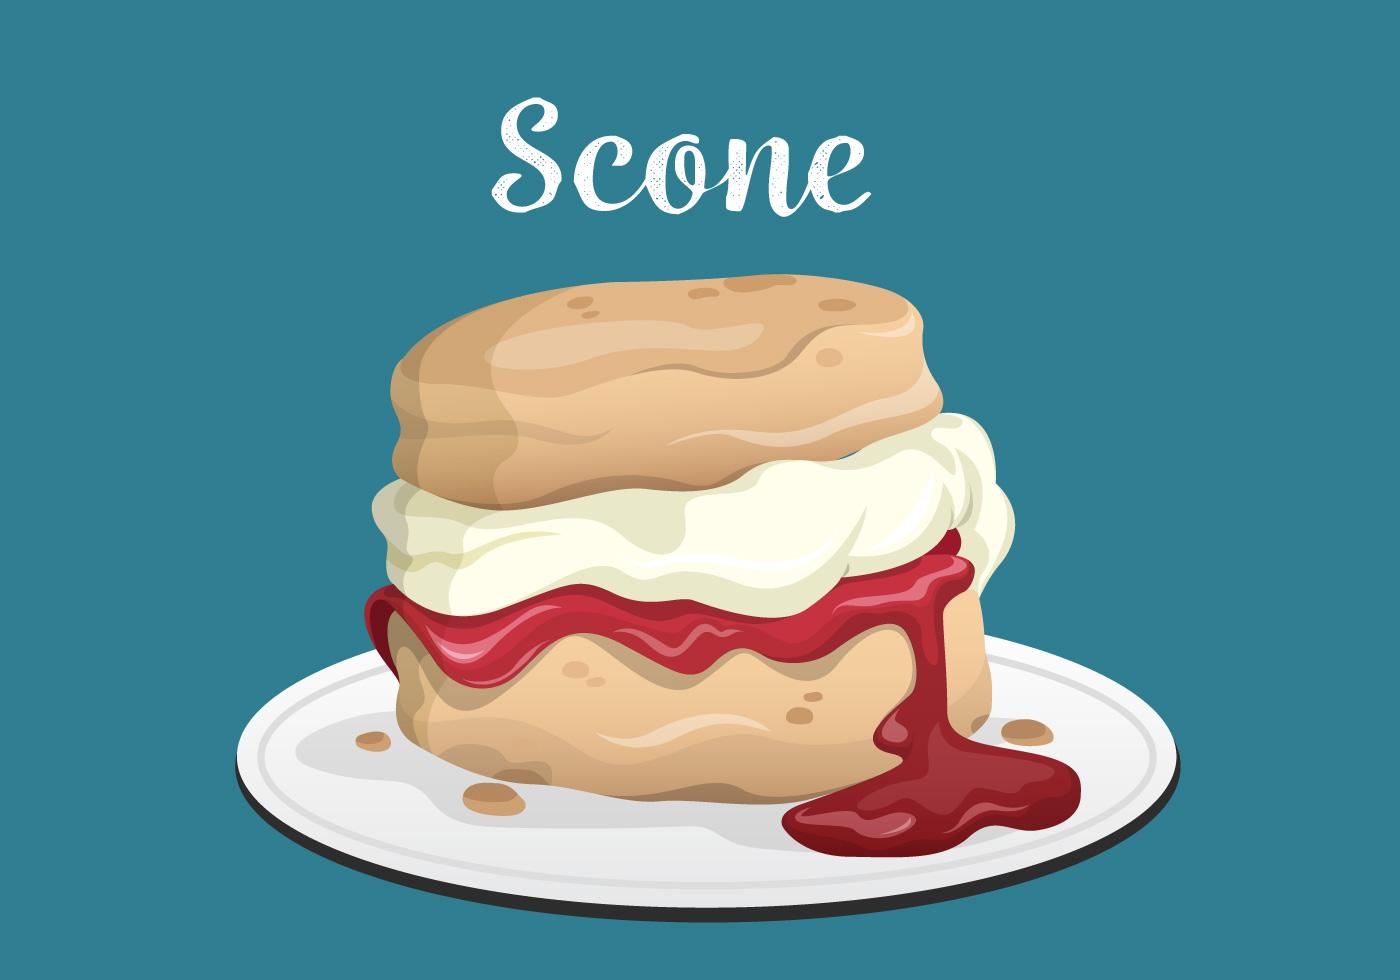 Scone Dessert Vector Background Illustration Download